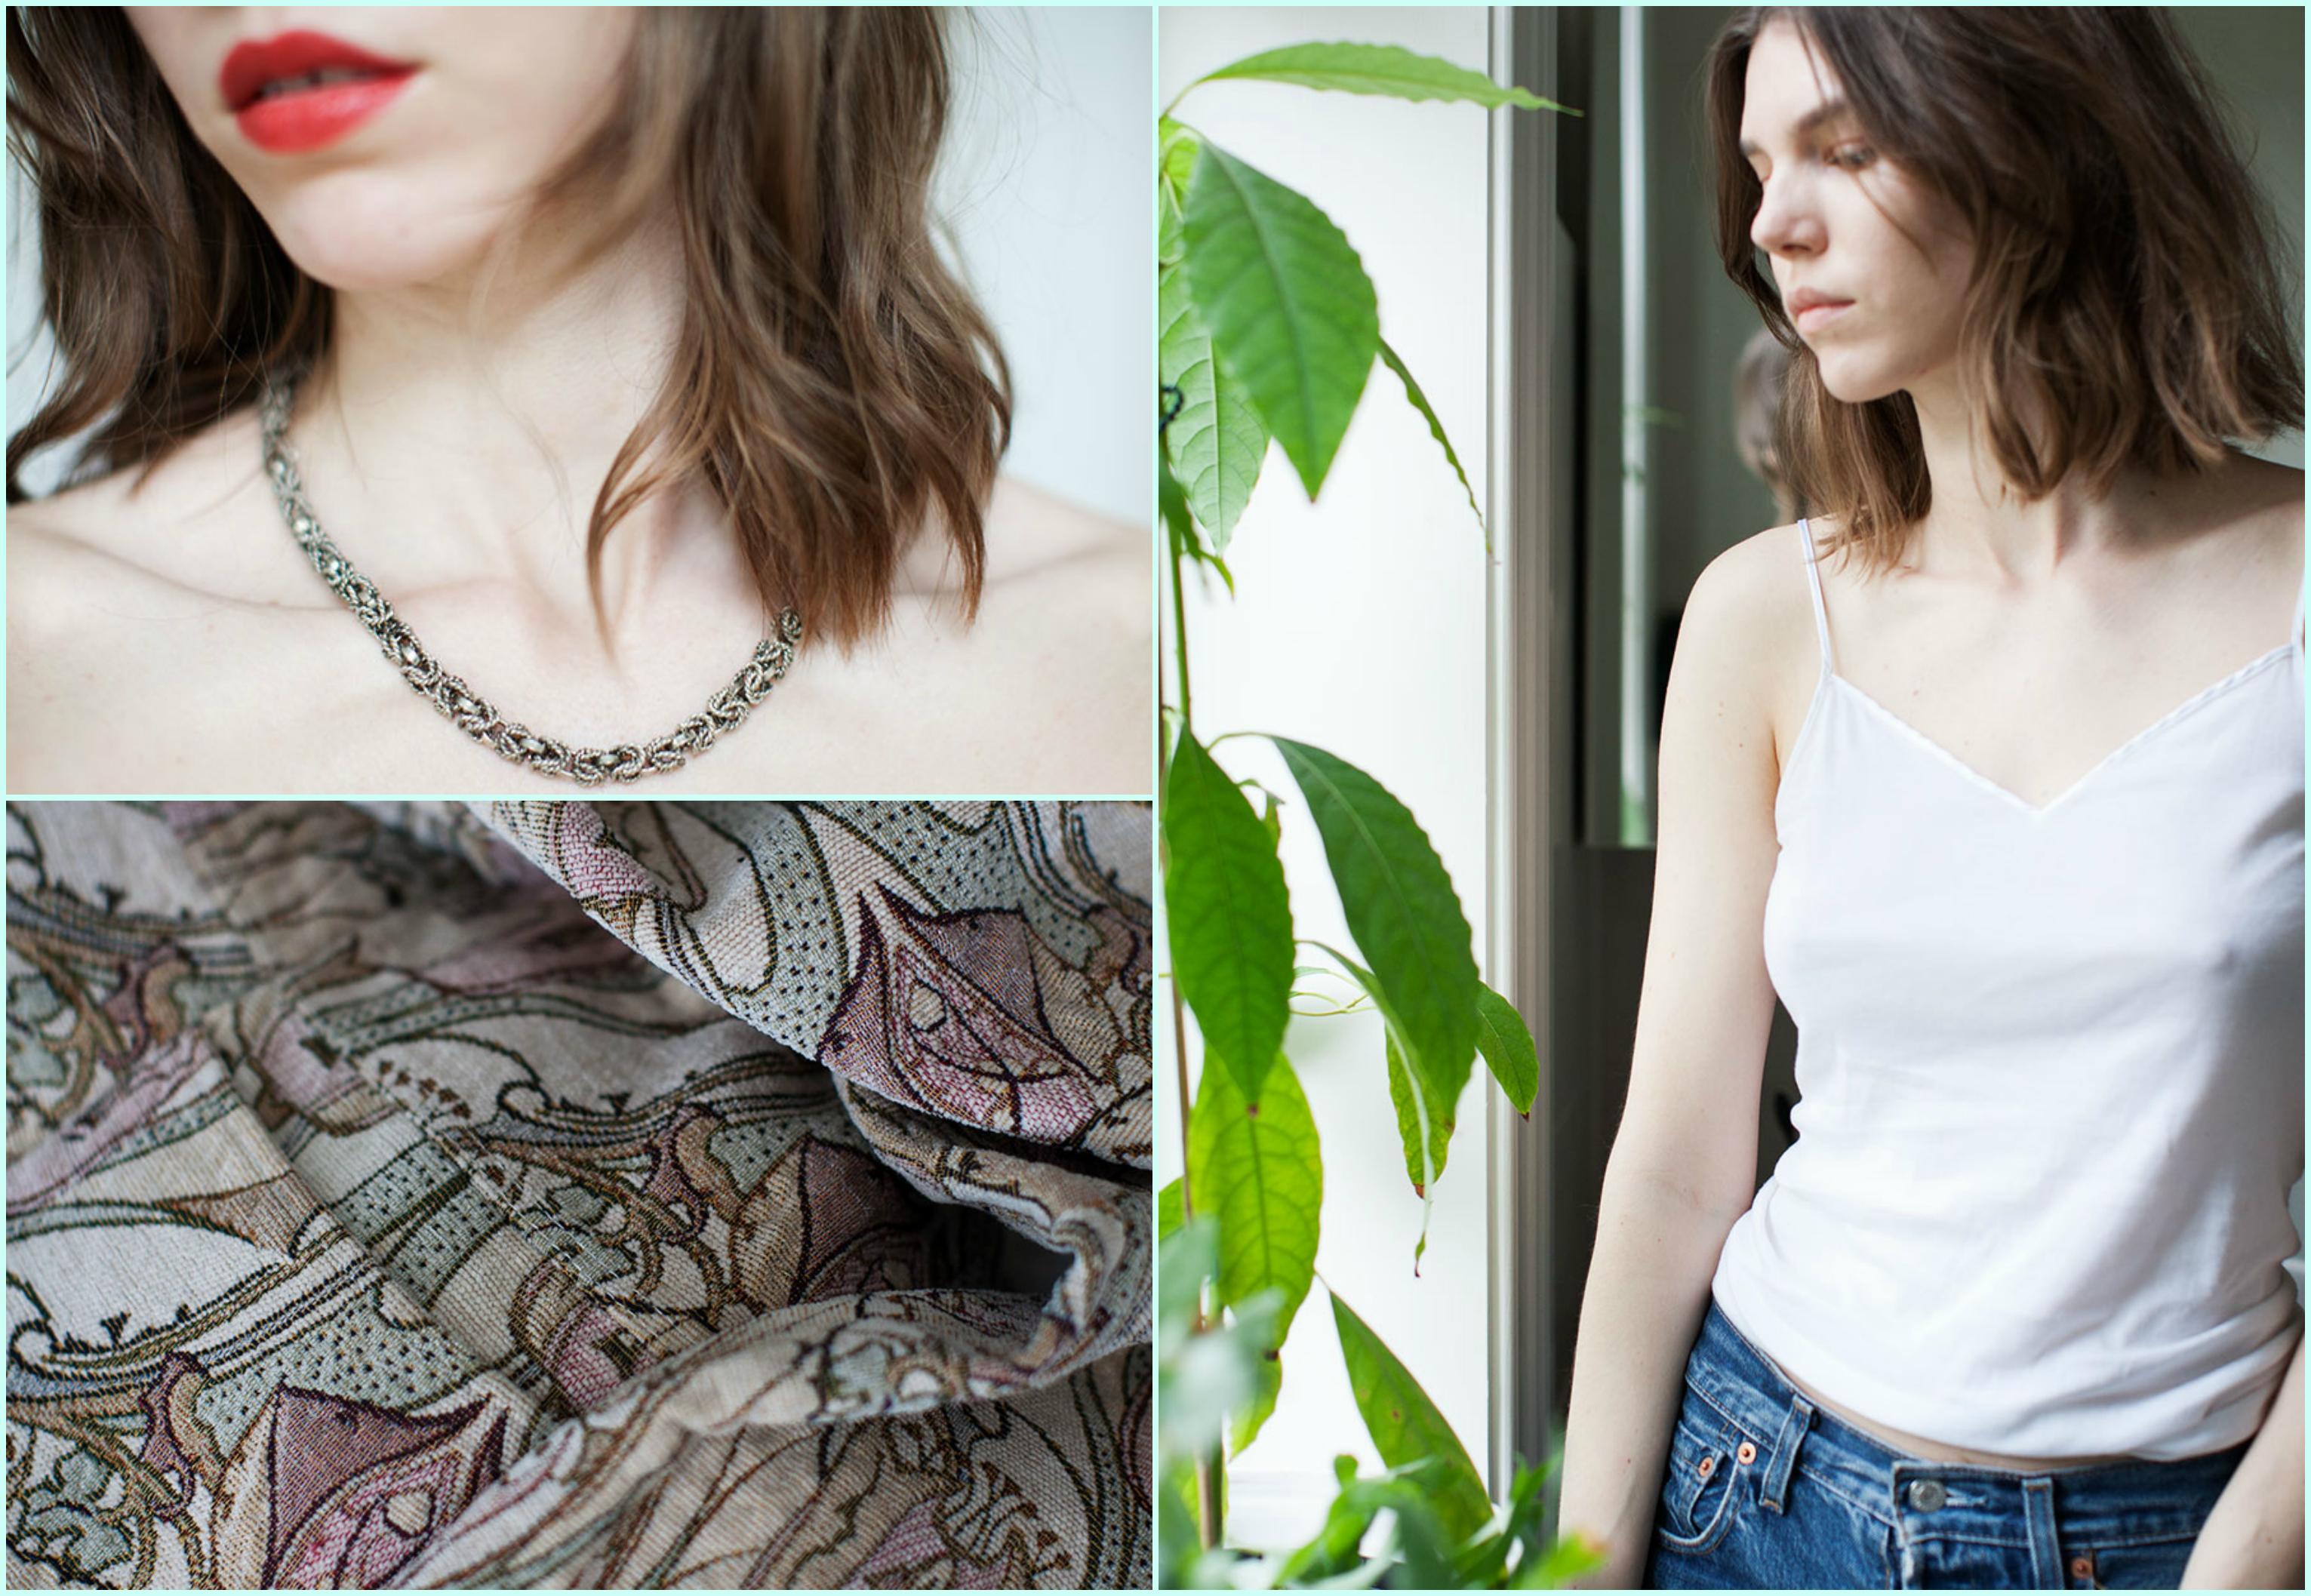 Maja3 Collage